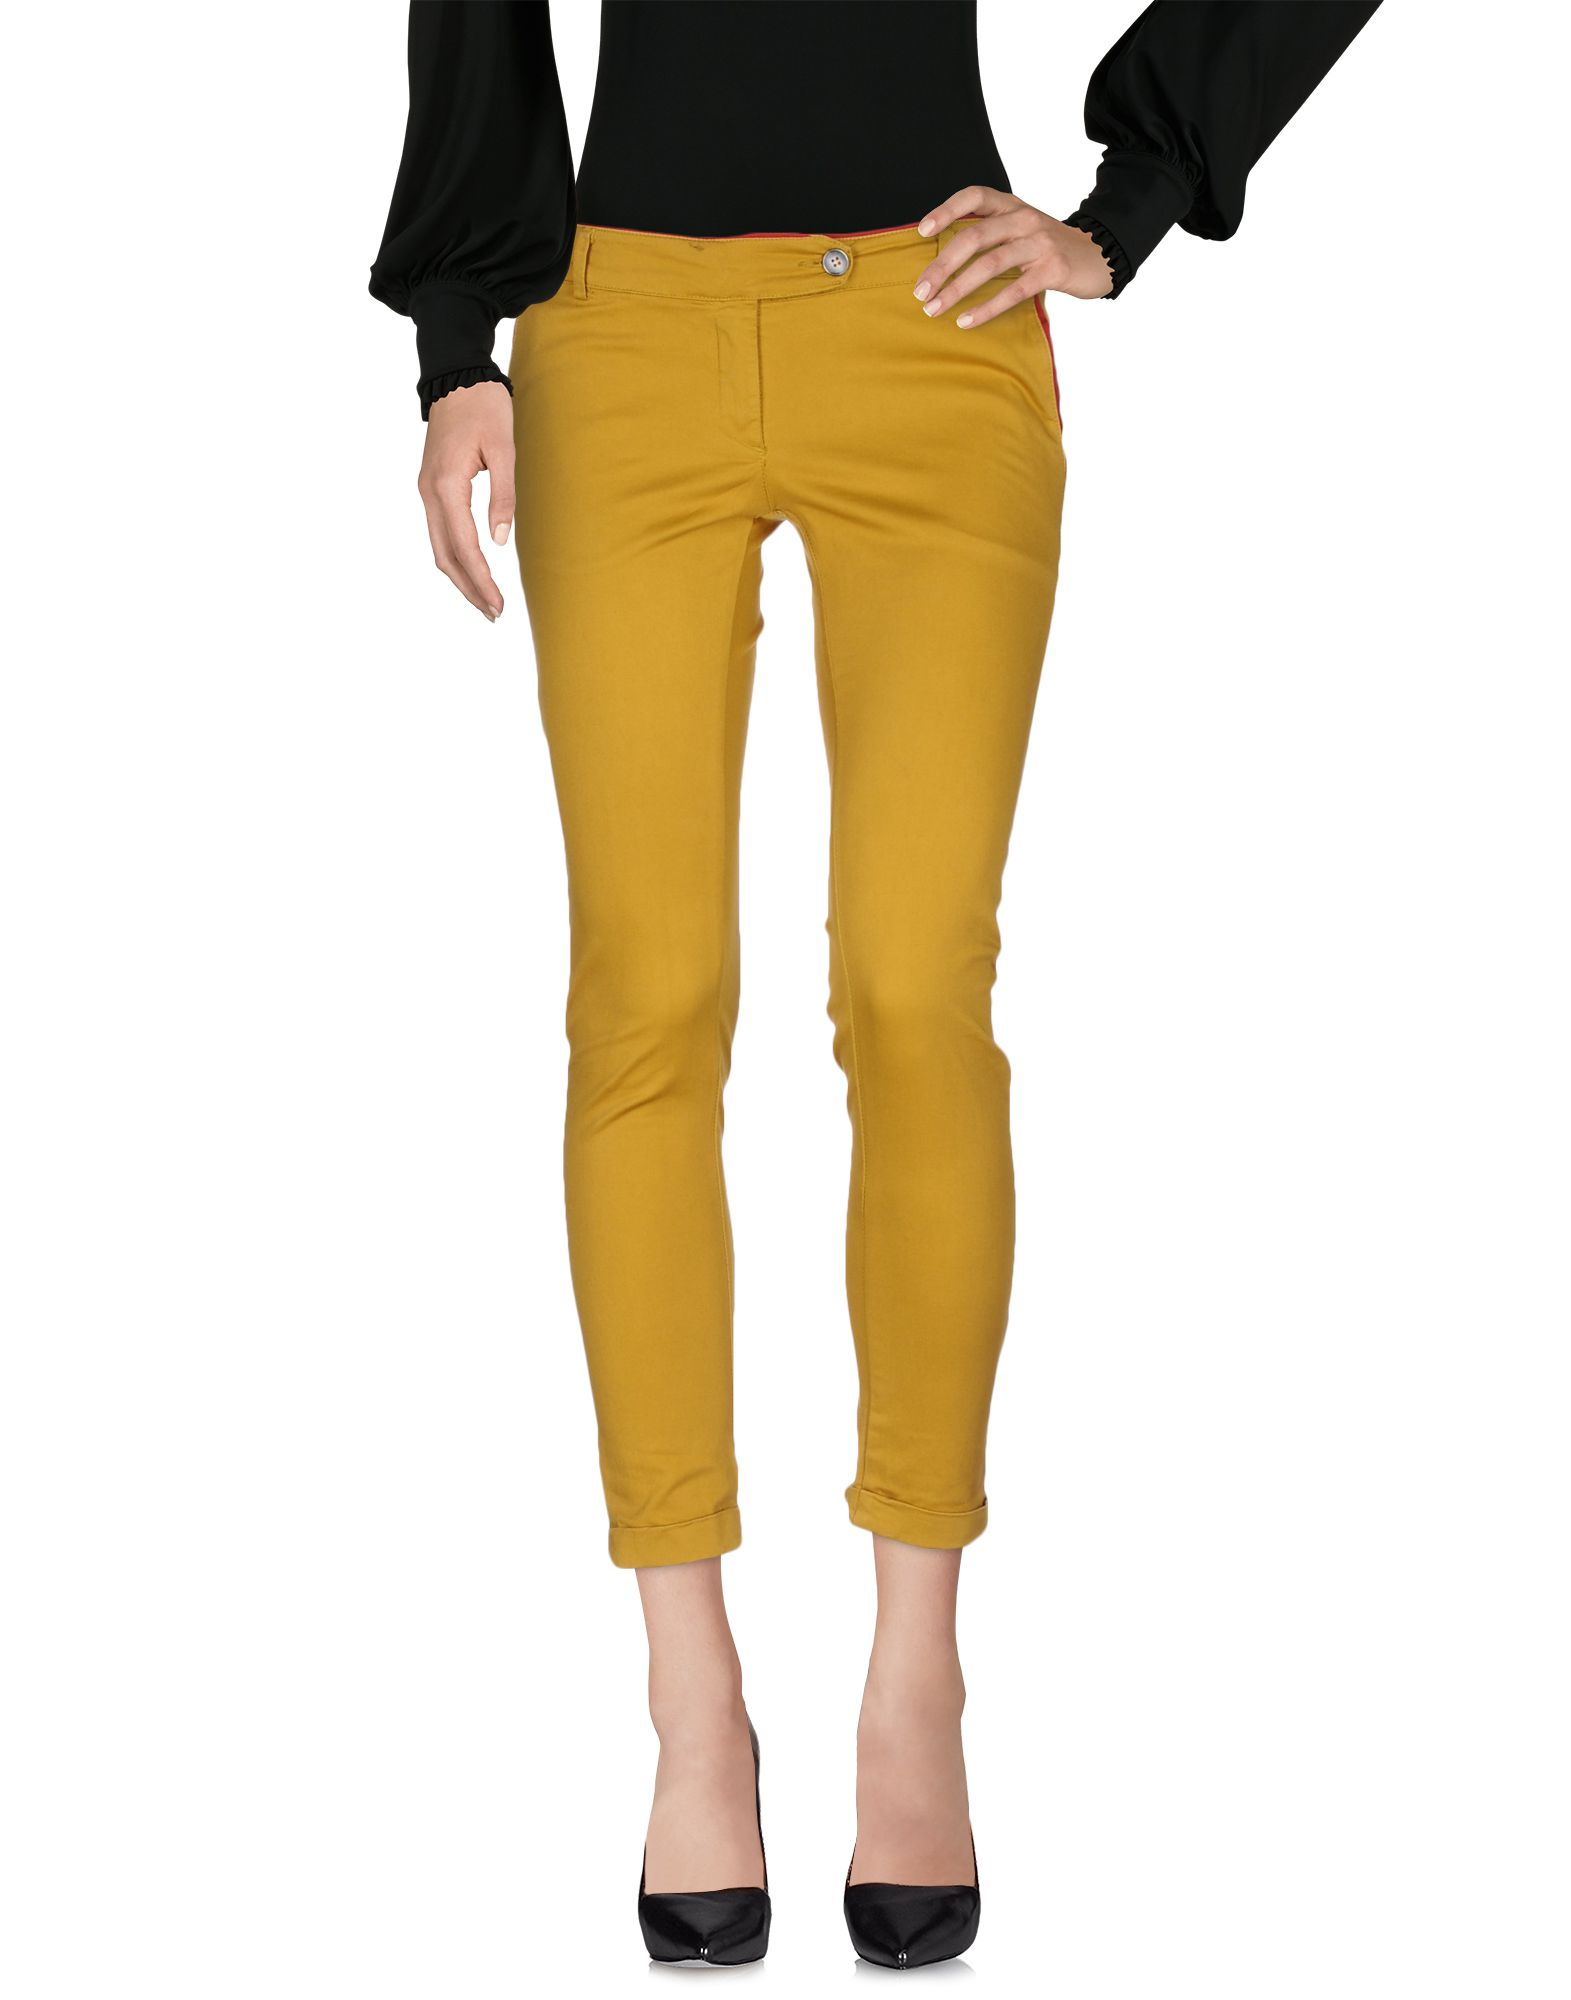 PRIVE' ITALIA Повседневные брюки h2o italia джинсовые брюки